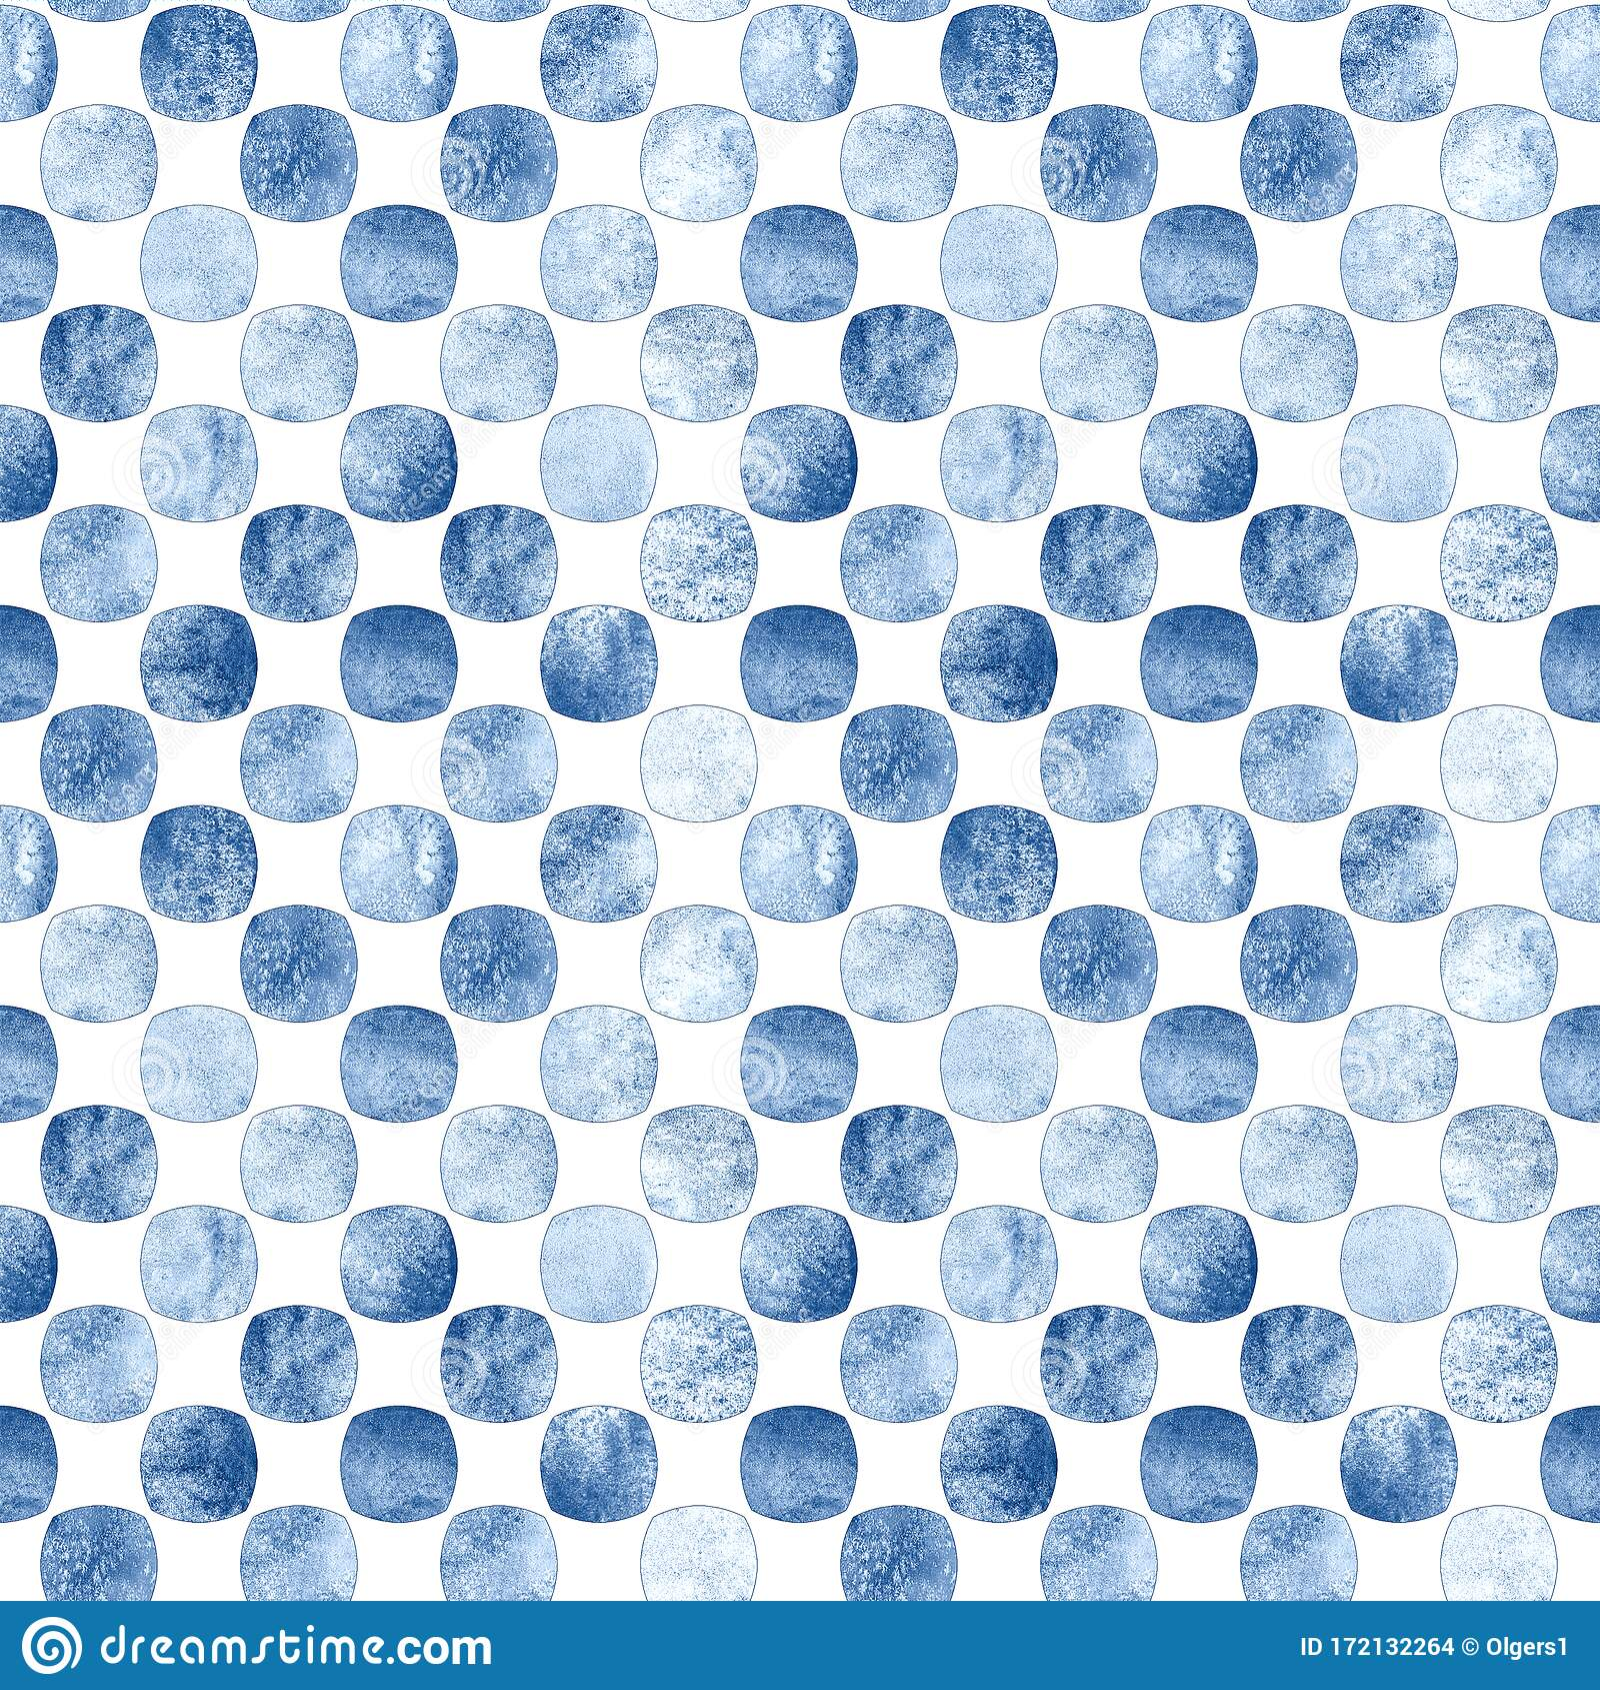 Seamless Geometric Pattern With Grunge Monochrome Blue